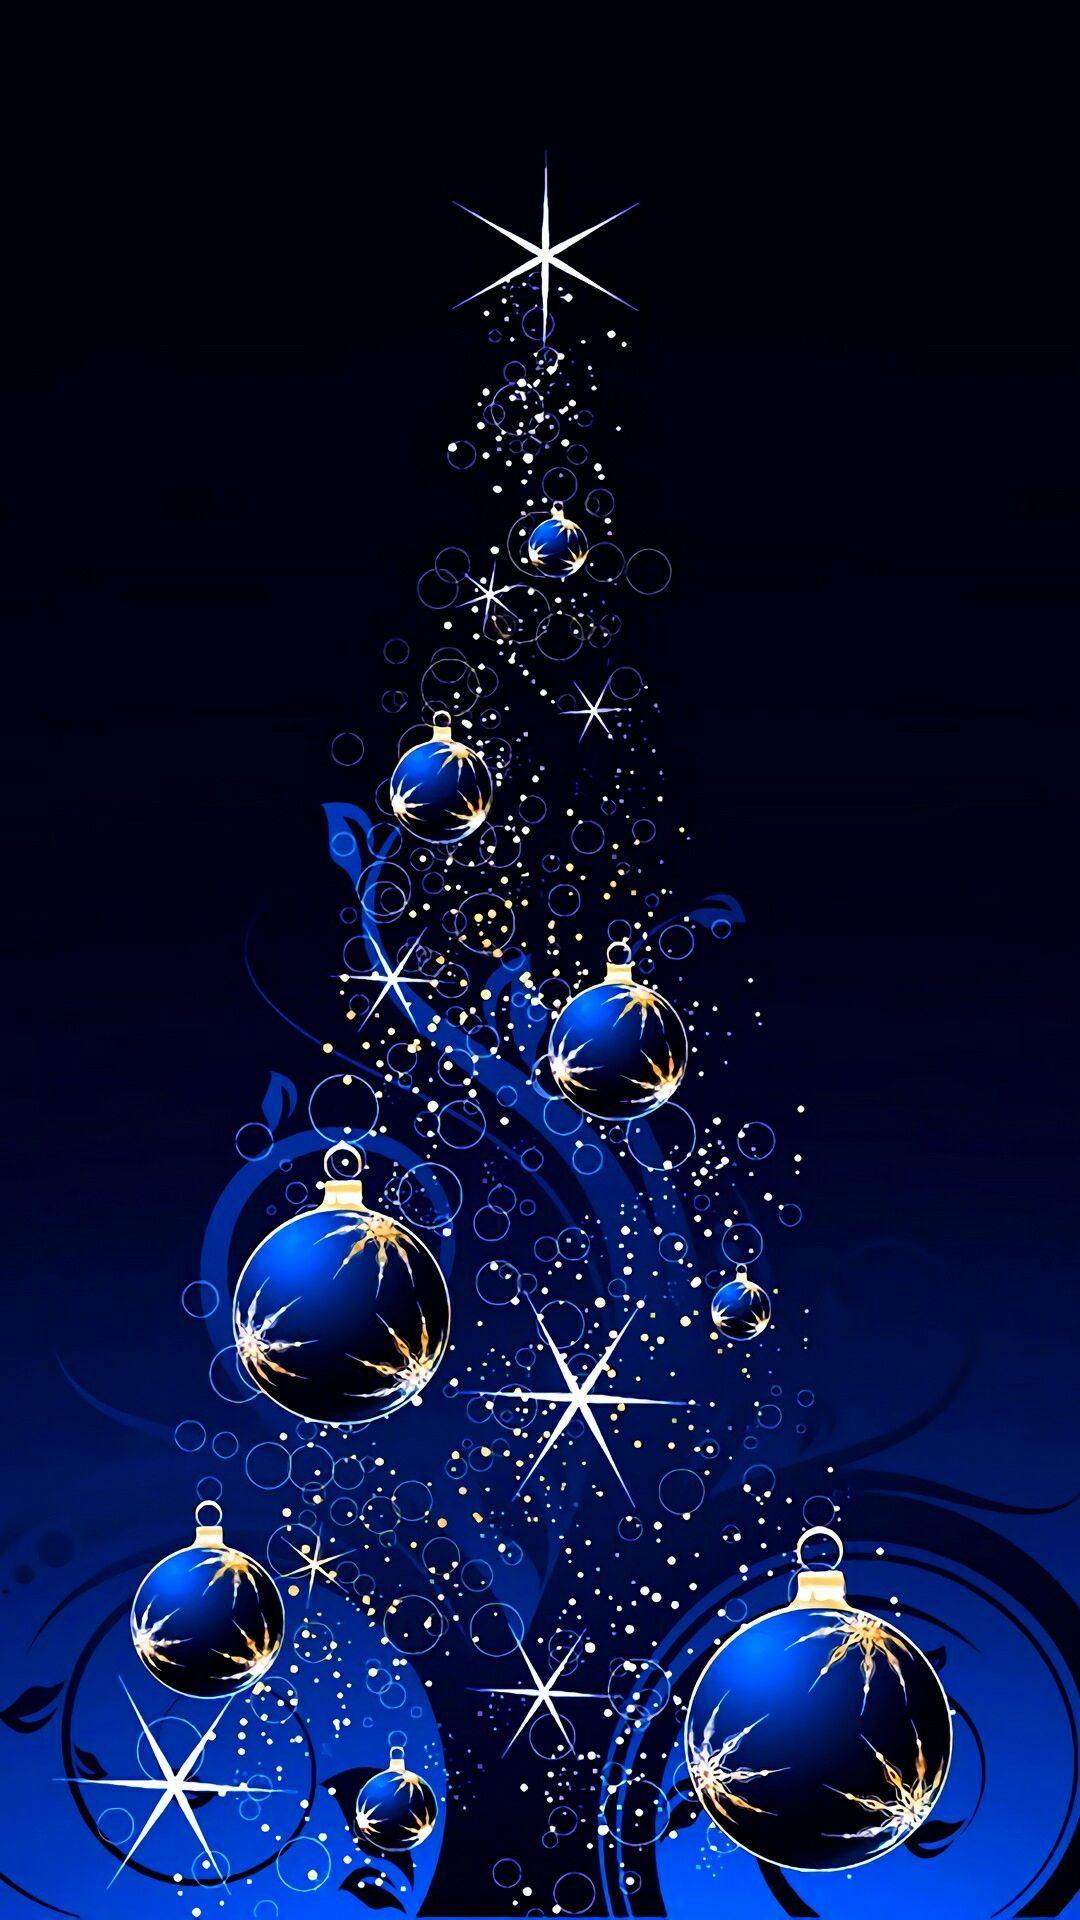 Arvore De Natal De Parede Parede Natal Wallpaper Iphone Christmas Christmas Wallpaper Christmas Wallpaper Backgrounds